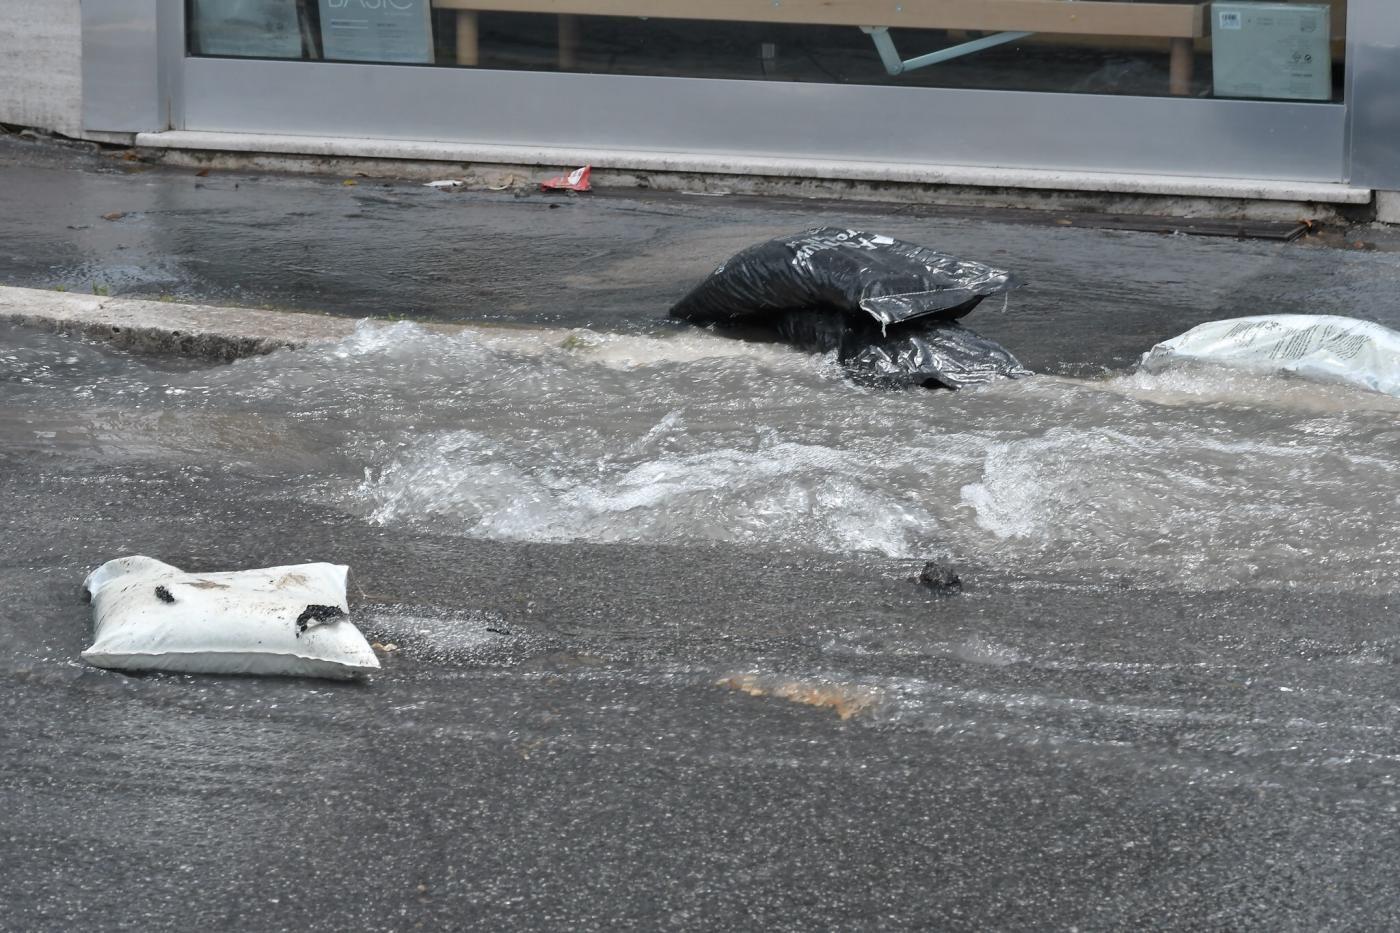 Chiusa via Nomentana per grossa perdita d?acqua dalla strada: bus deviati